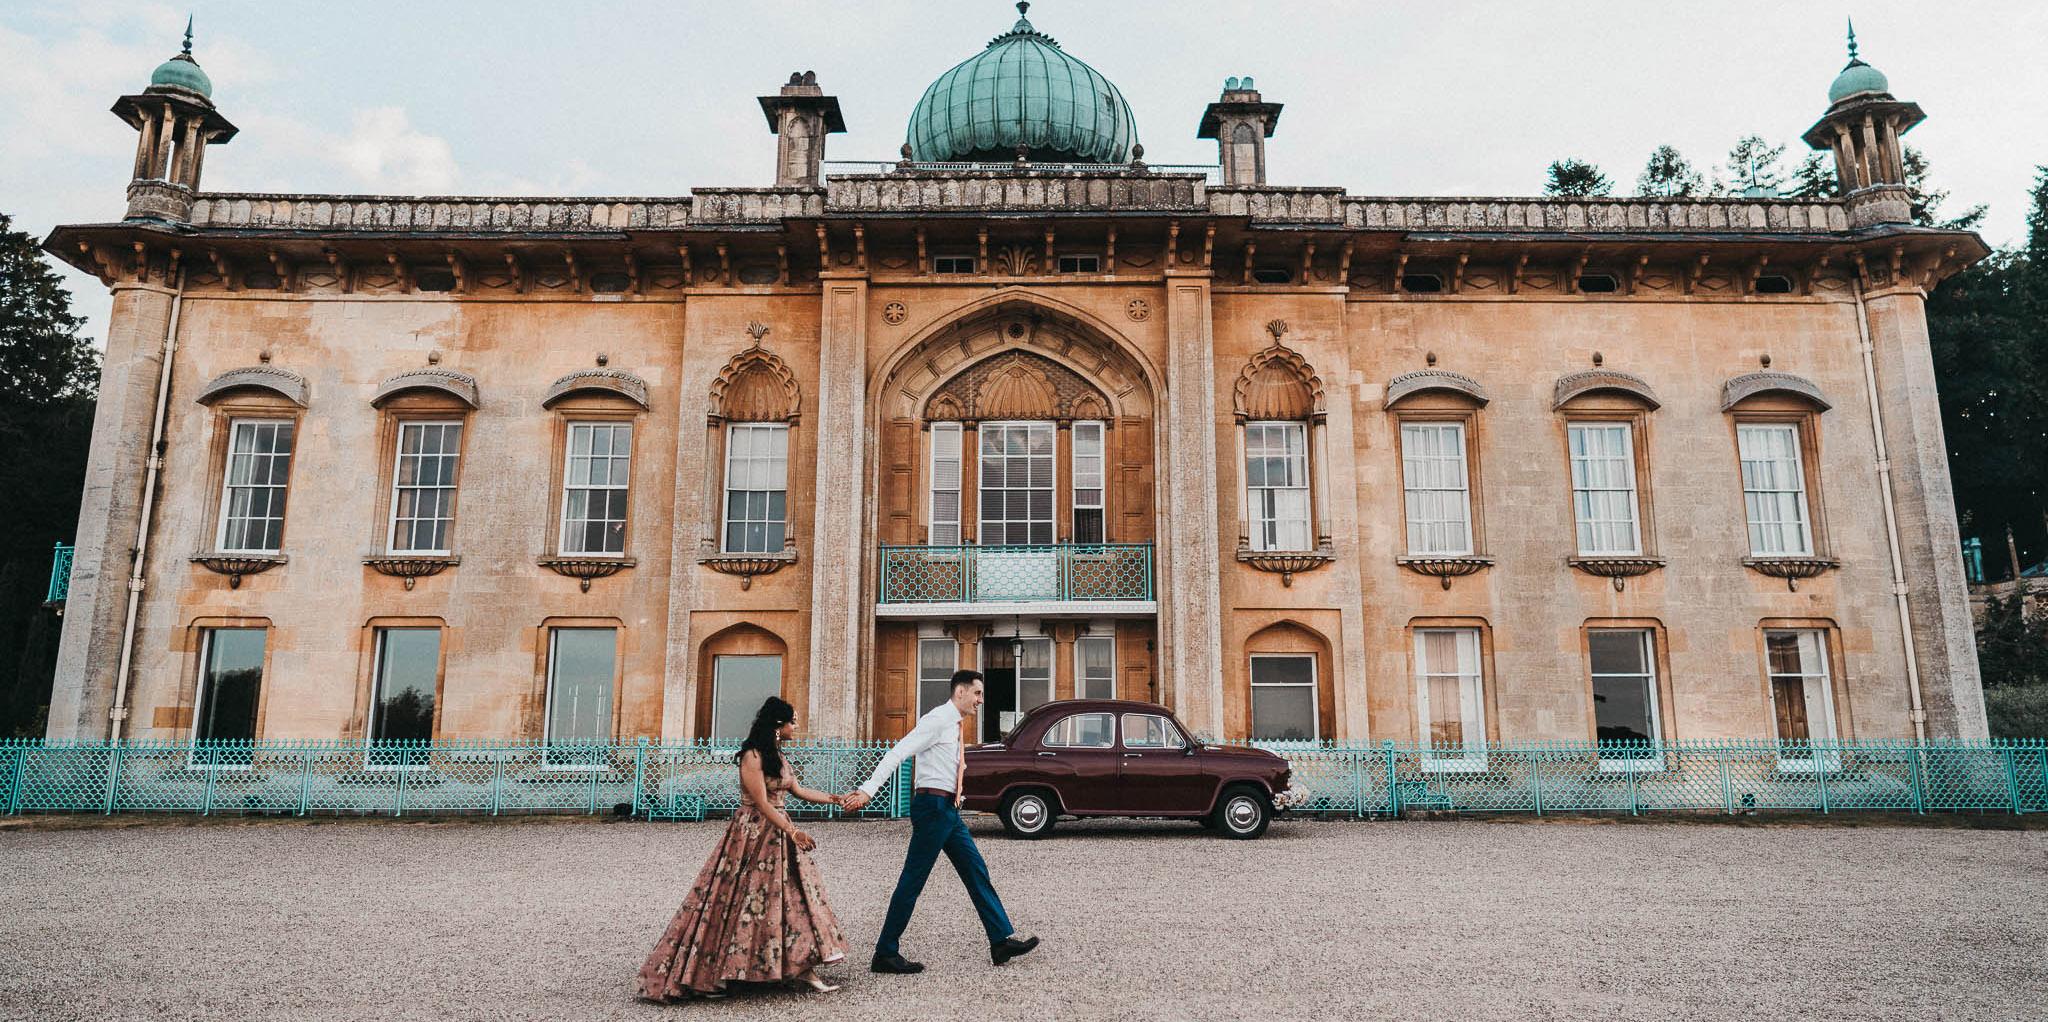 sezincote-wedding-bride-and-groom-in-front-of-building.jpg